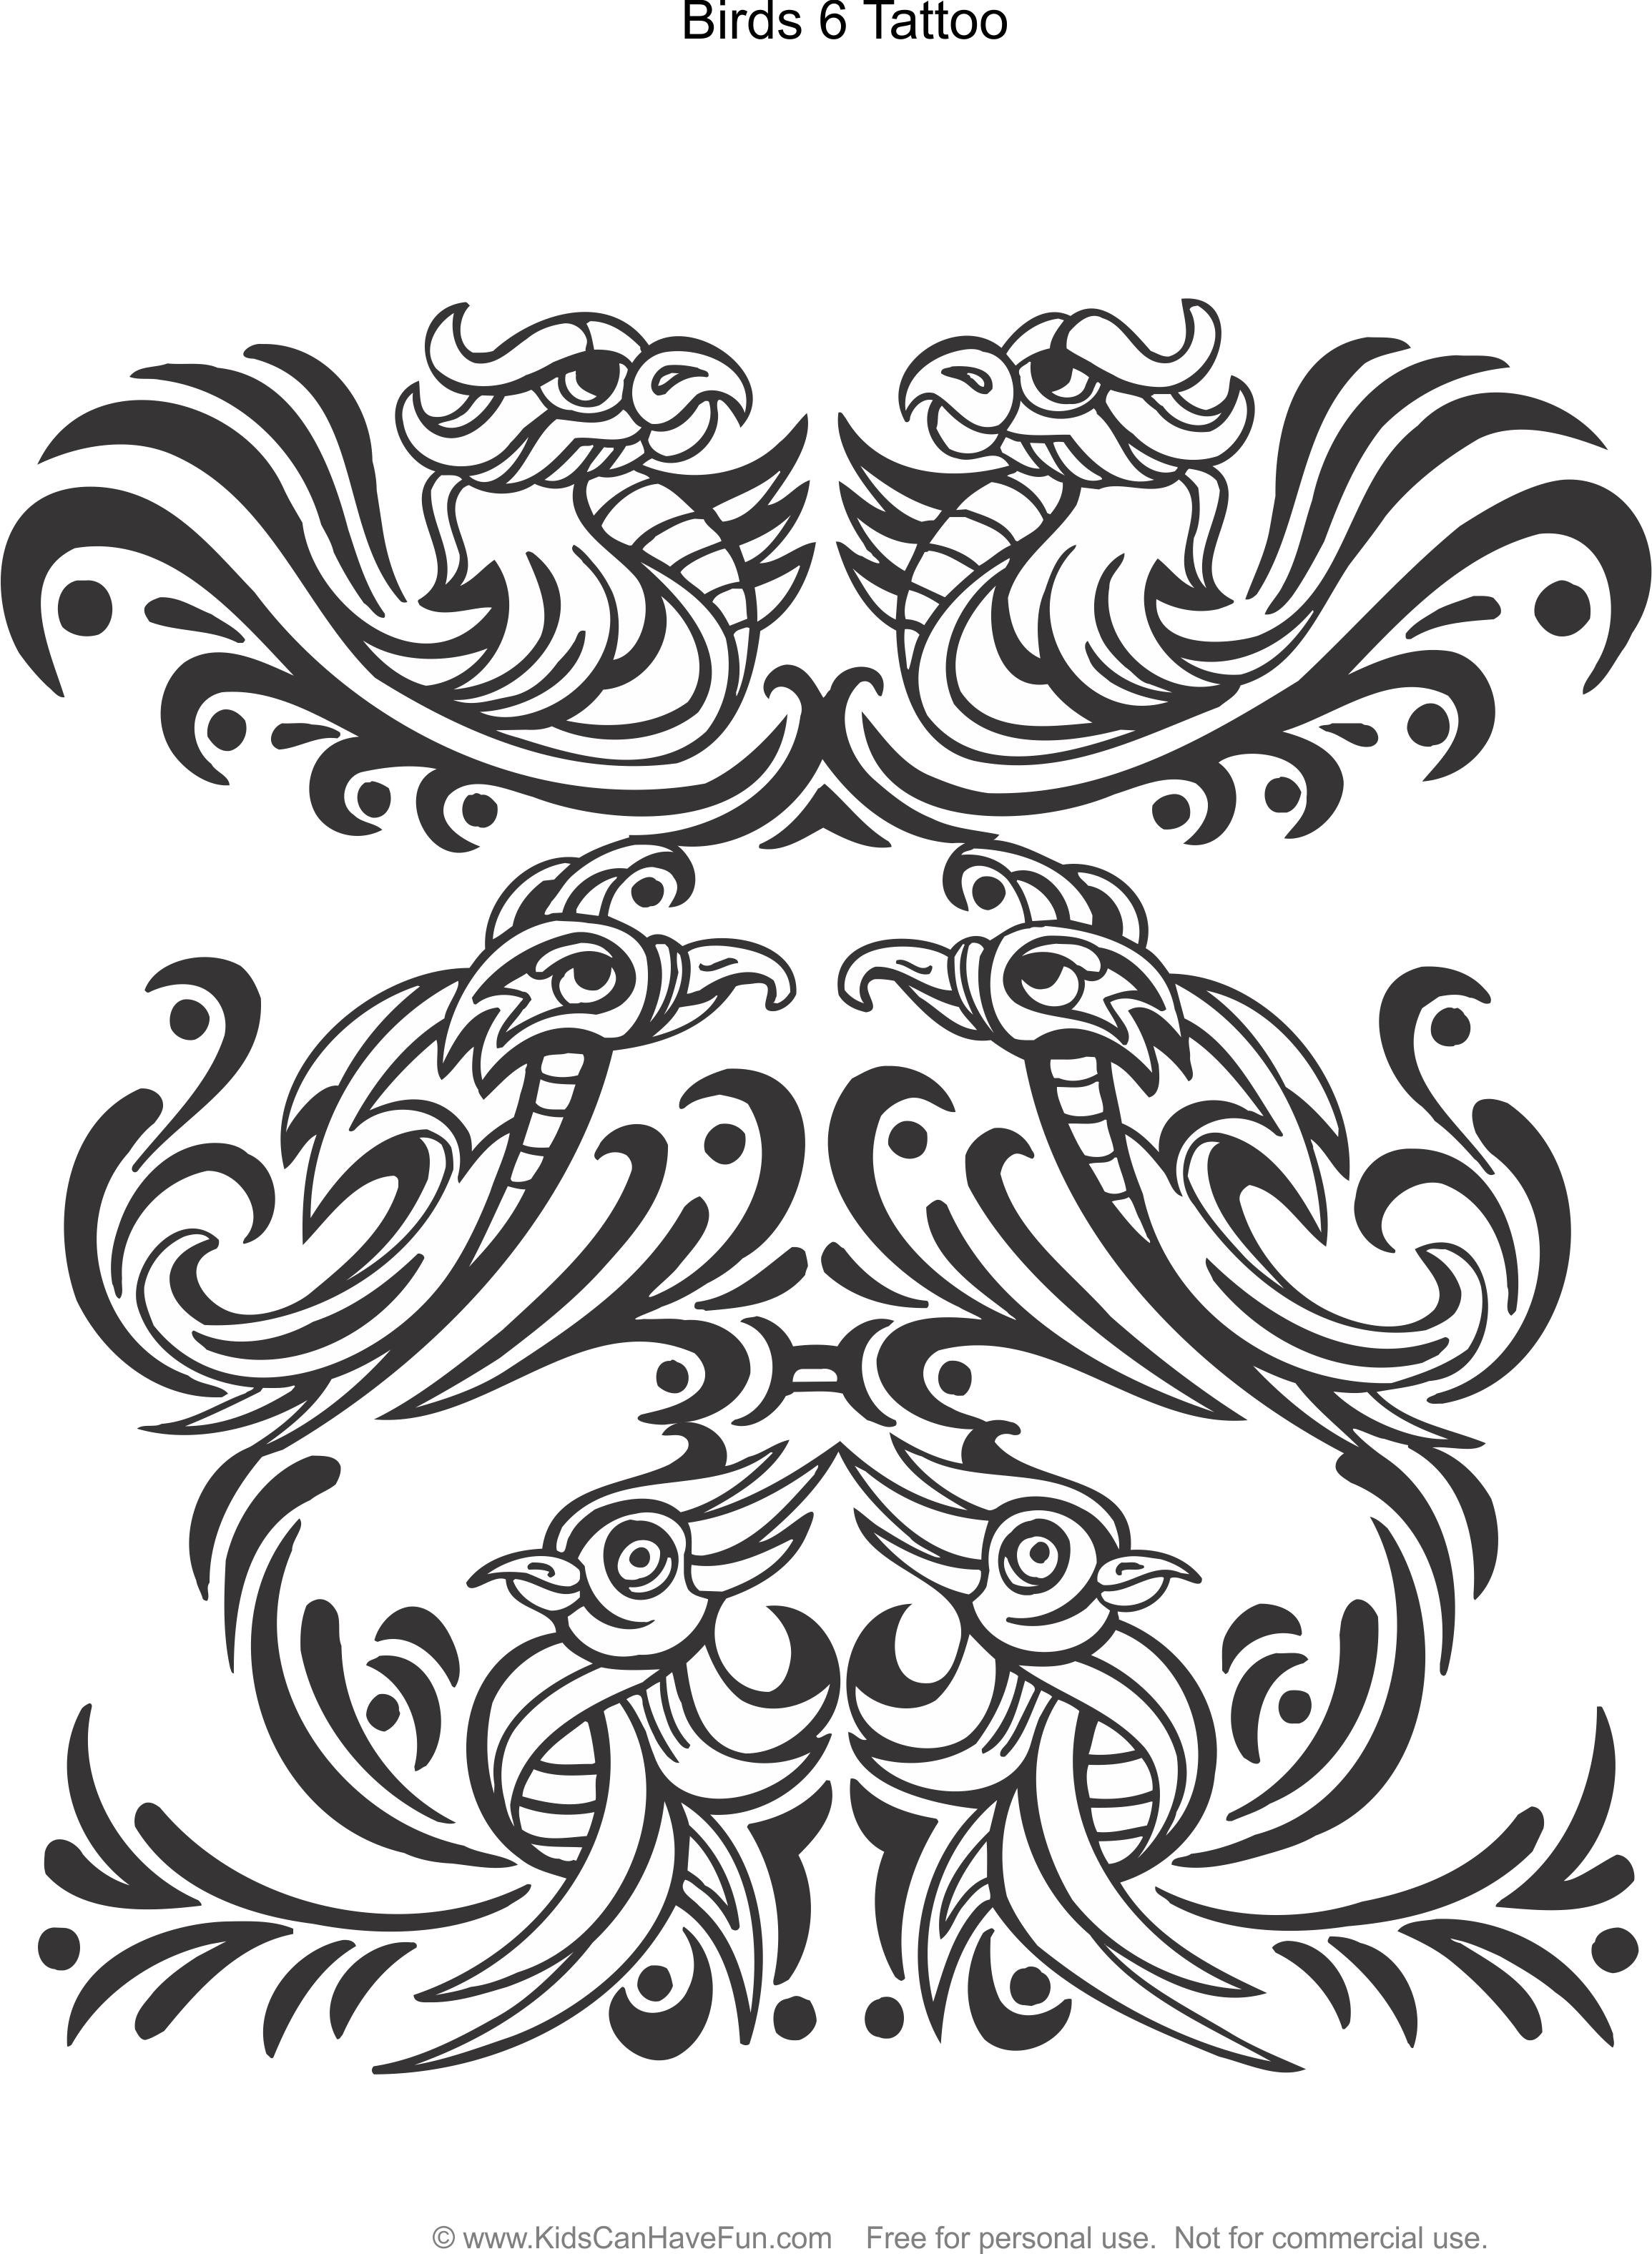 Birds 6 Tattoo Design Coloring Page Kidscanhavefun